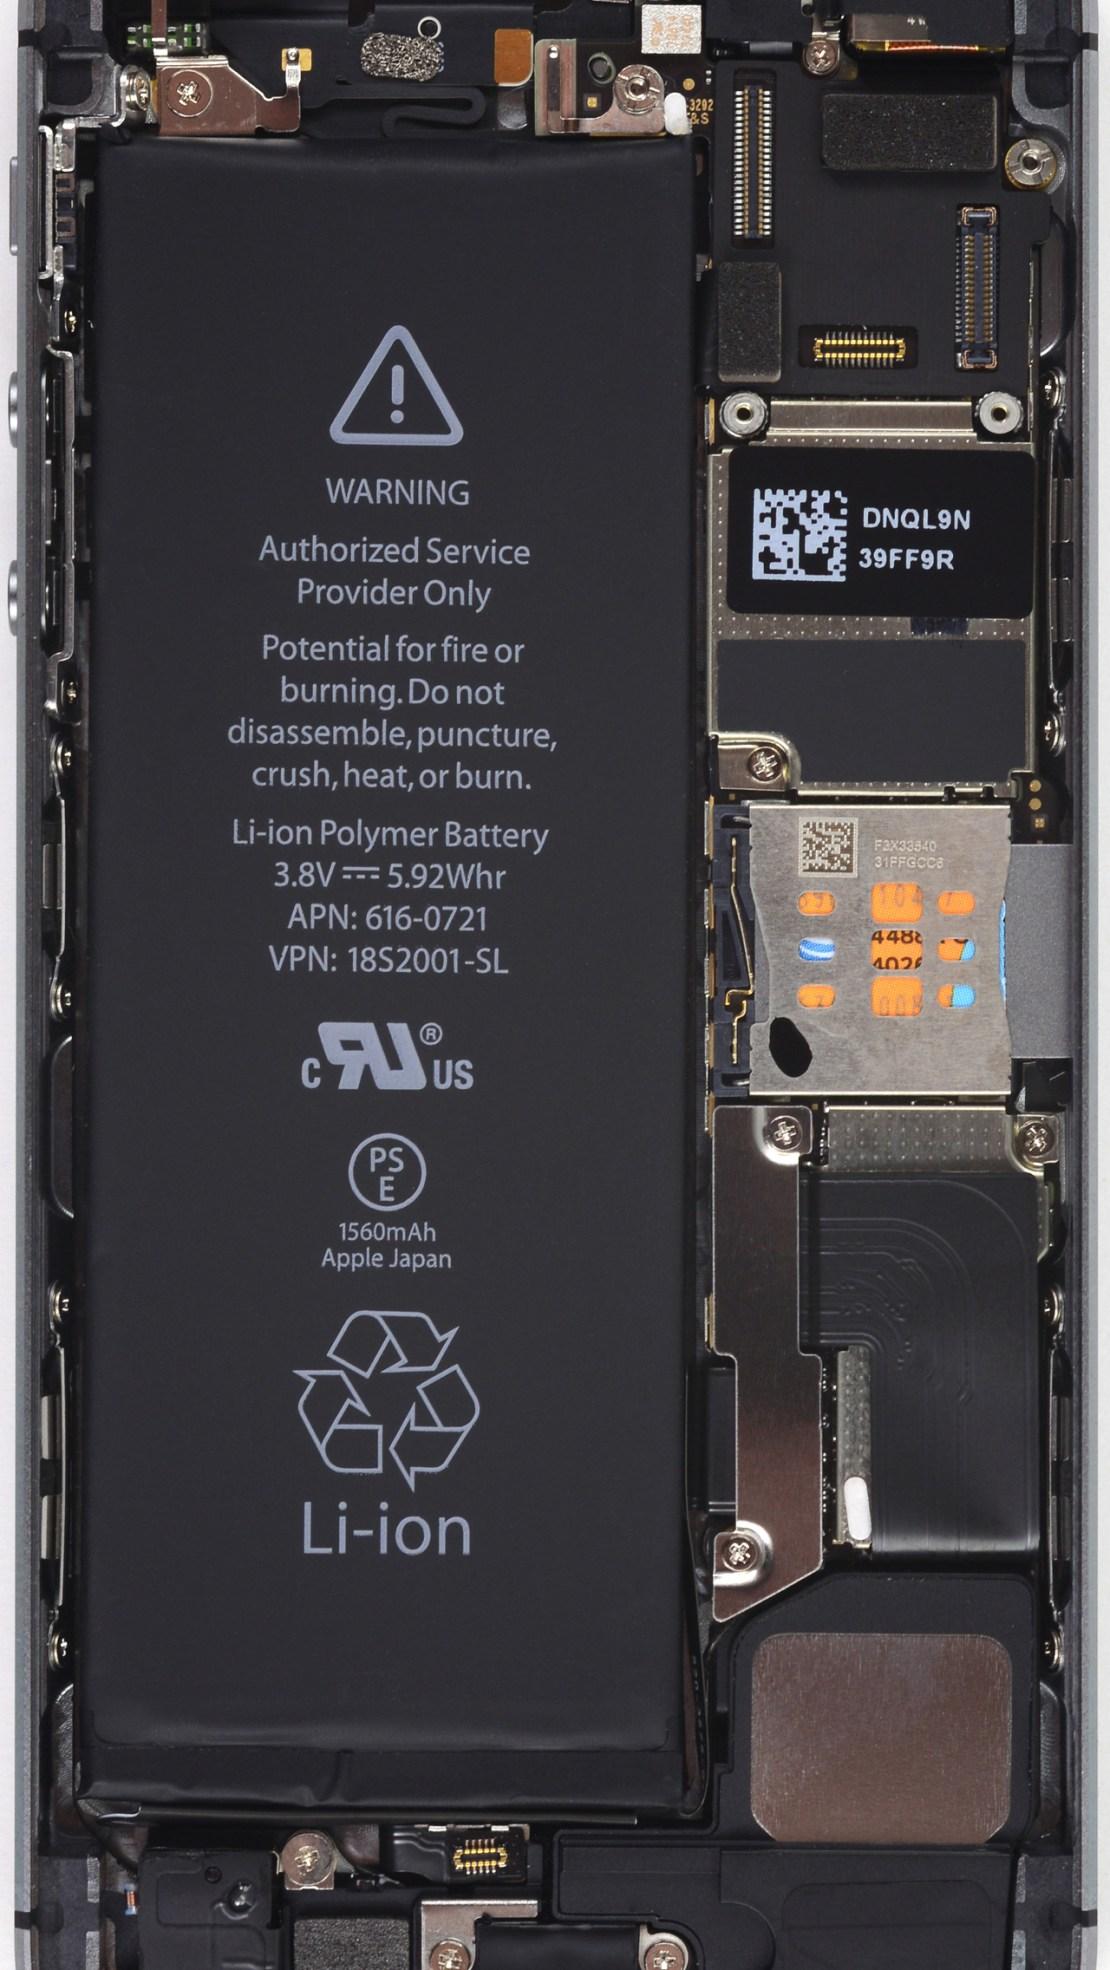 Tapeta iPhone 5s wnętrze smartfona